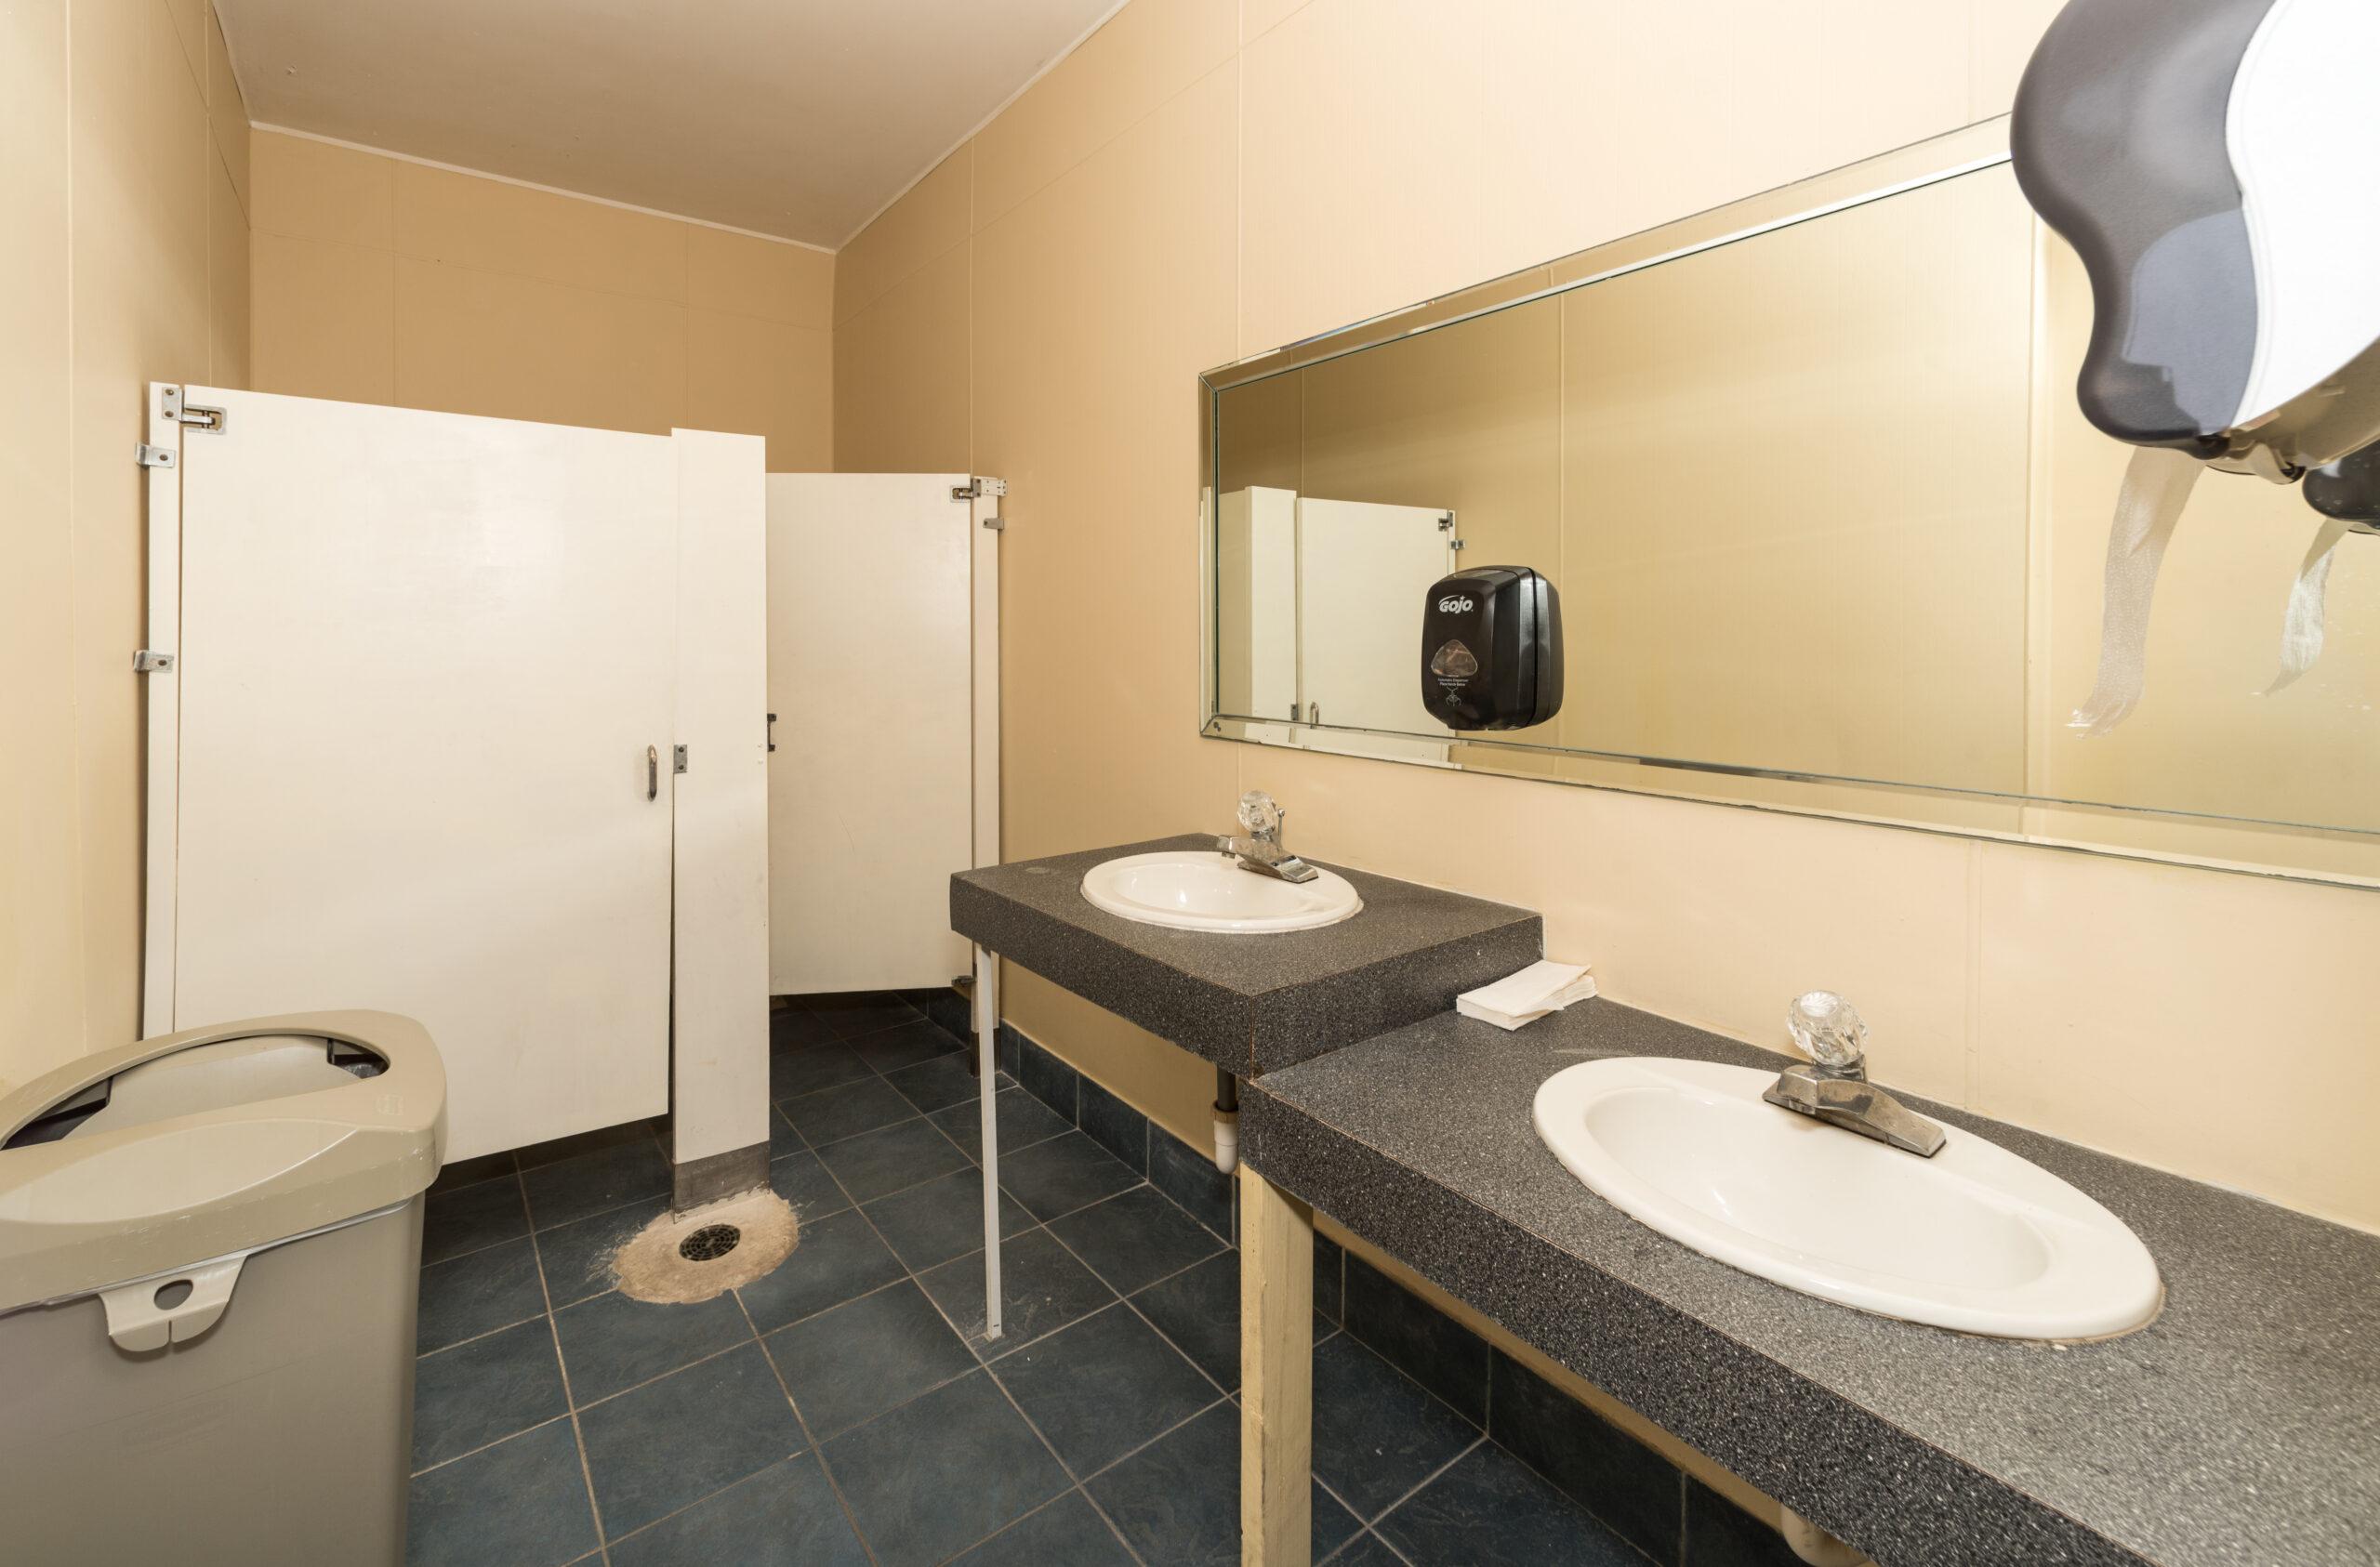 Bathroom remodel in Sunny Isles Fl